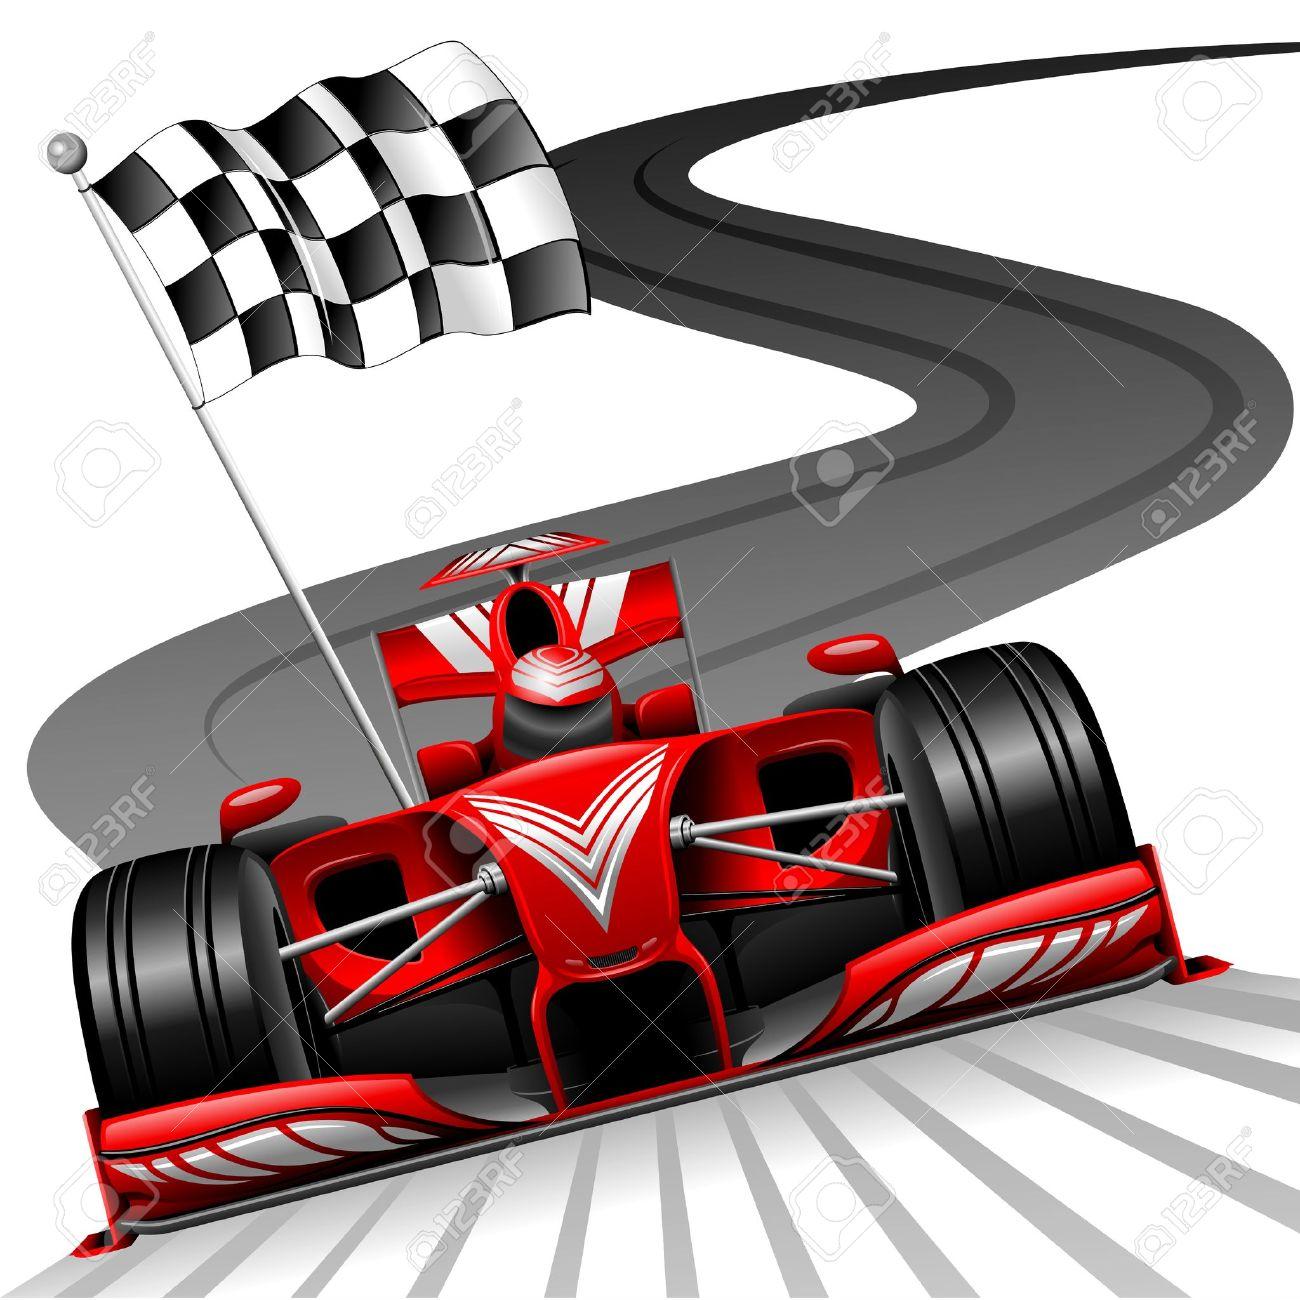 formula 1 images free  Formula 9 Red Car on Race Track